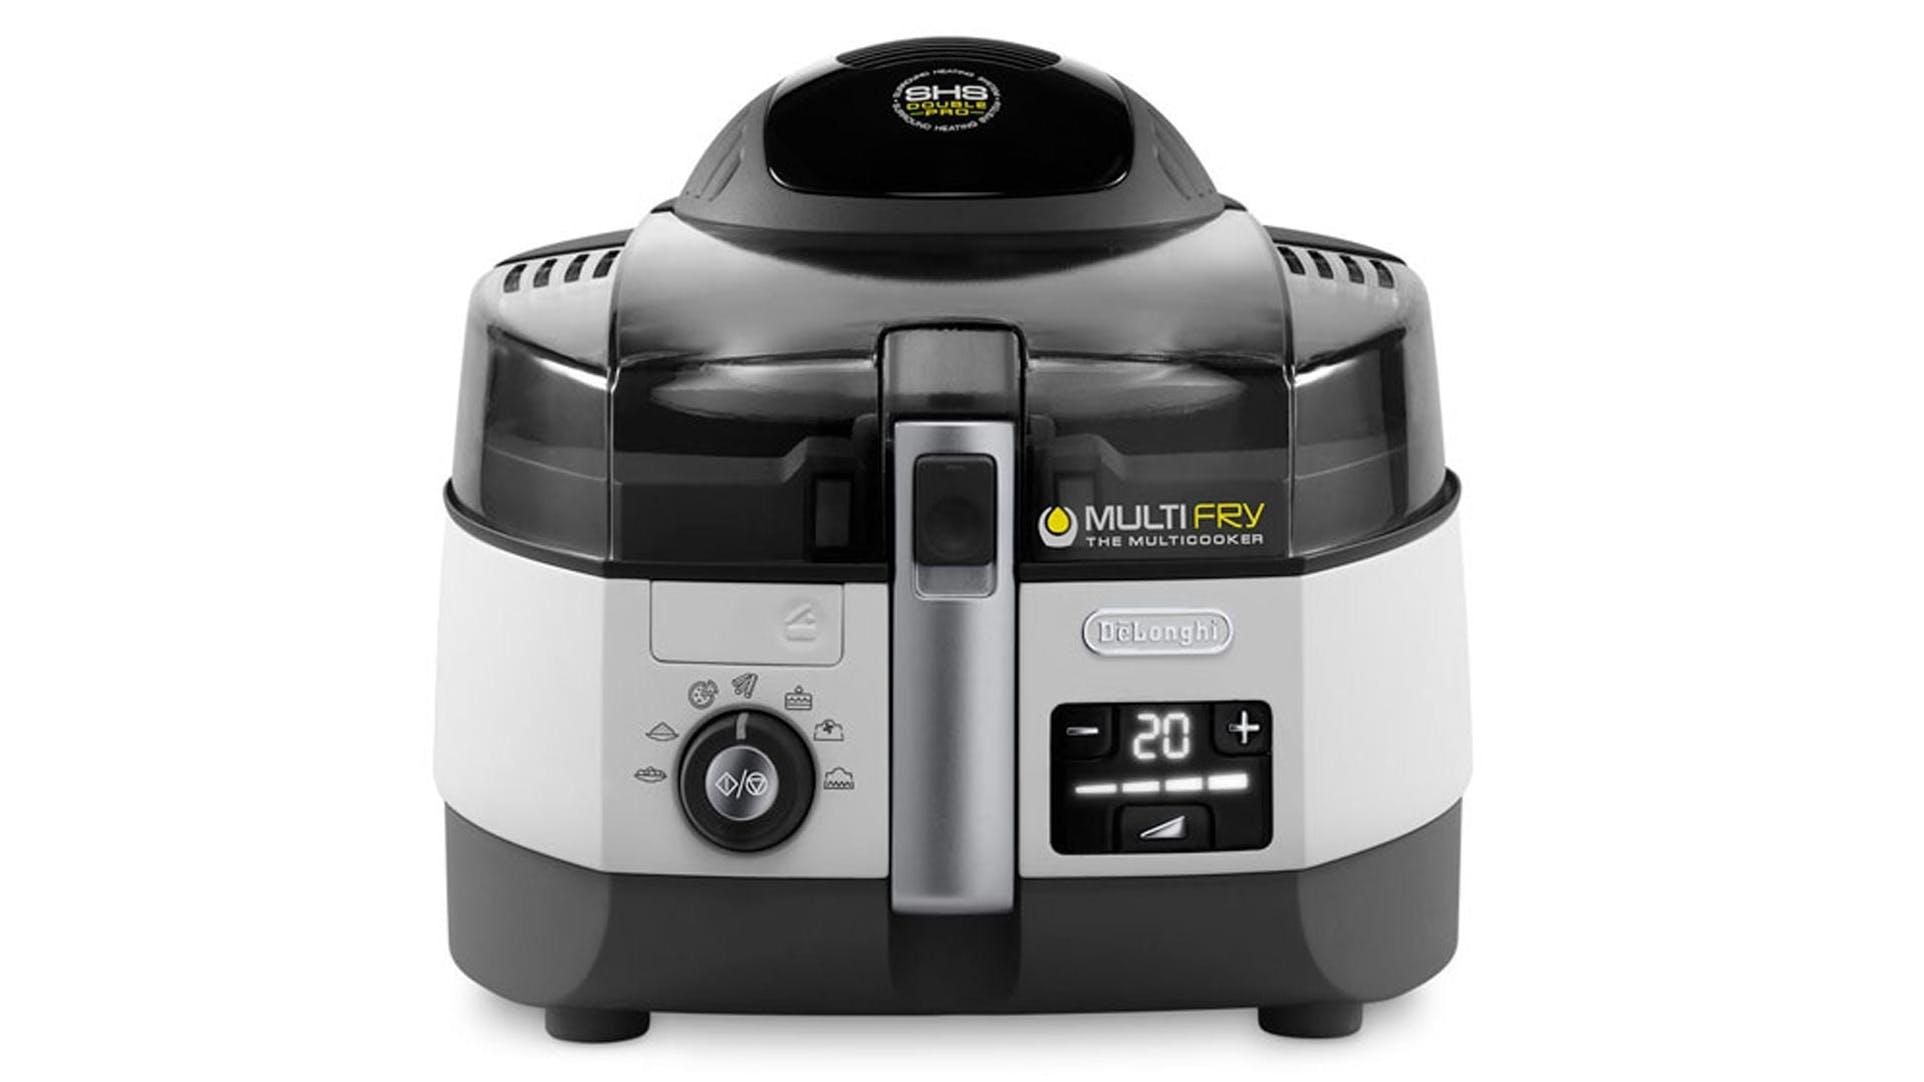 DeLonghi FH1394 Extra Chef Multicooker